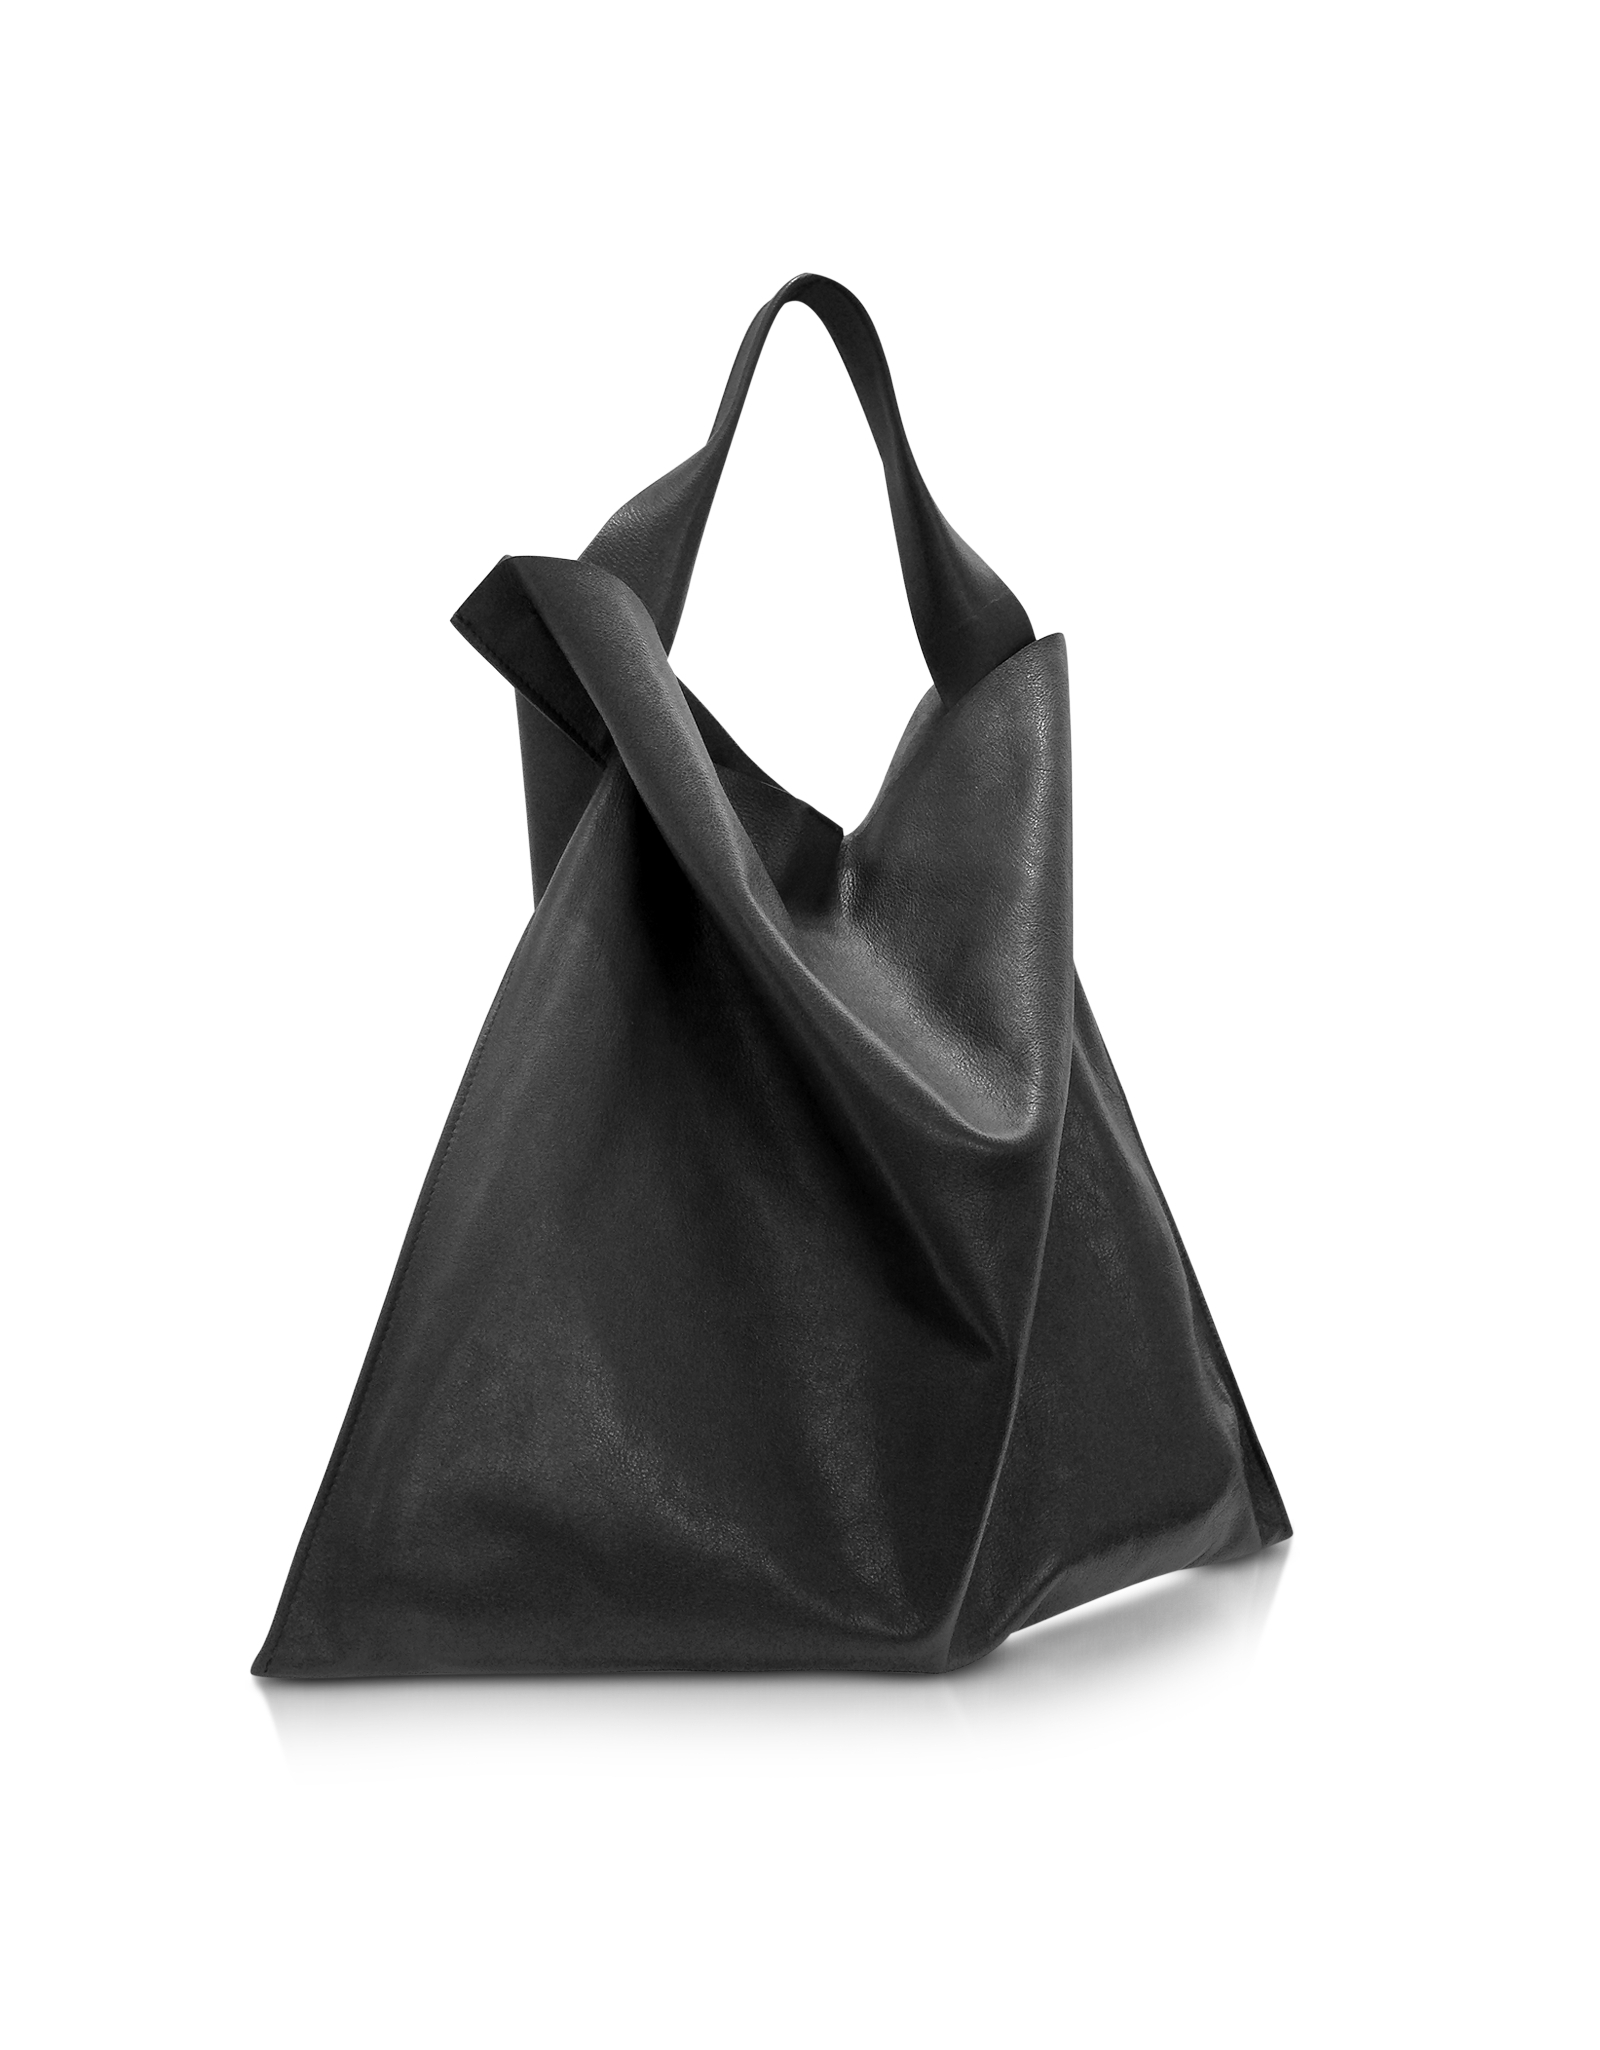 76483ebcc08a Lyst - Jil Sander Black Leather Xiao Bag in Black